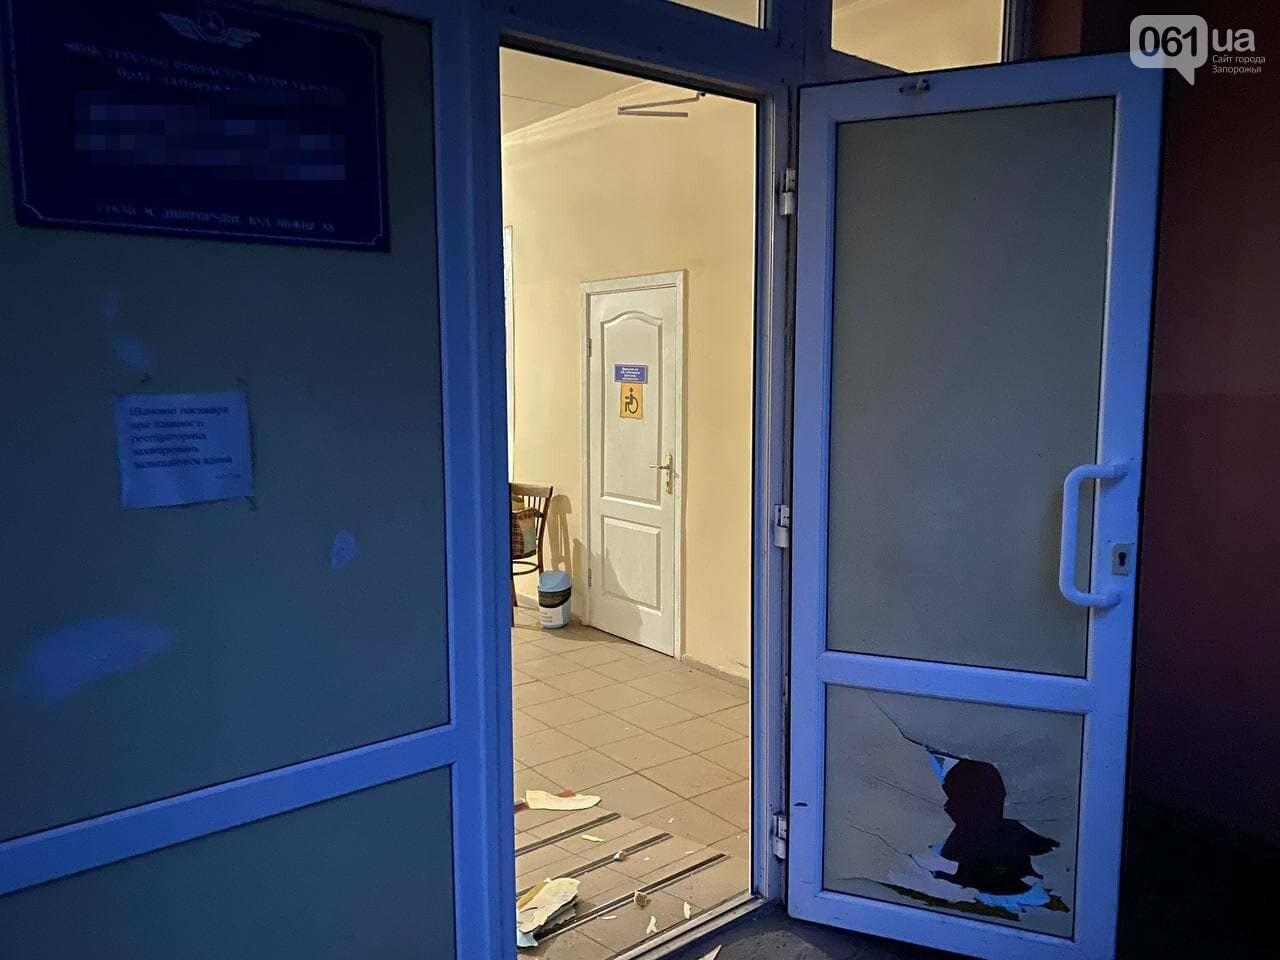 19550853028408589228404626986579109531830230n 60b9da0c28065 - В Запорожской области задержали мужчину, который разбил двери и проник в автовокзал